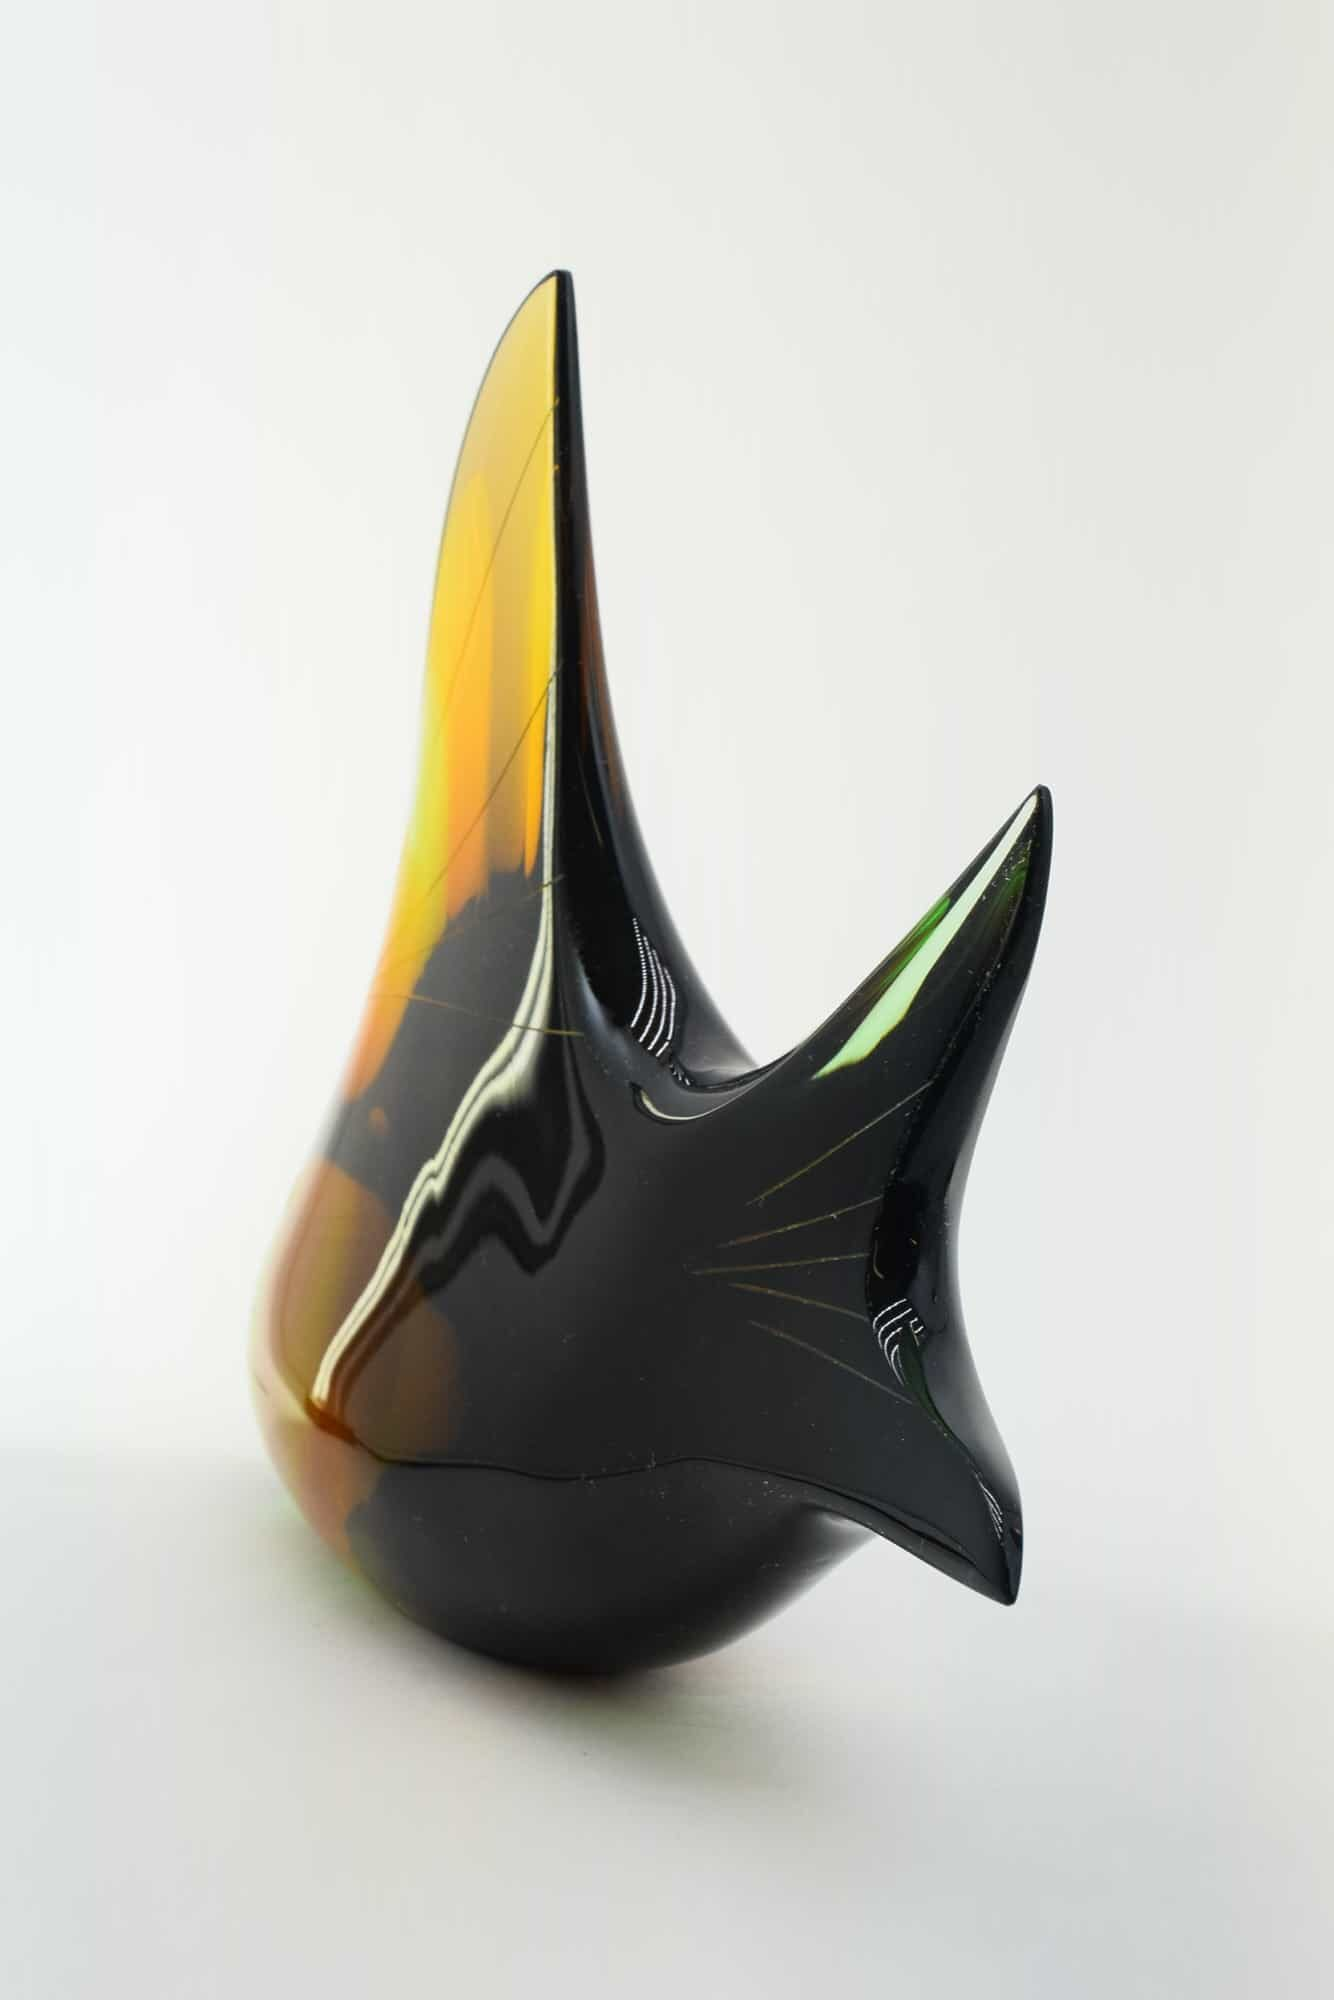 Vintage Fish Glassware Exbor - (Art. 36754)